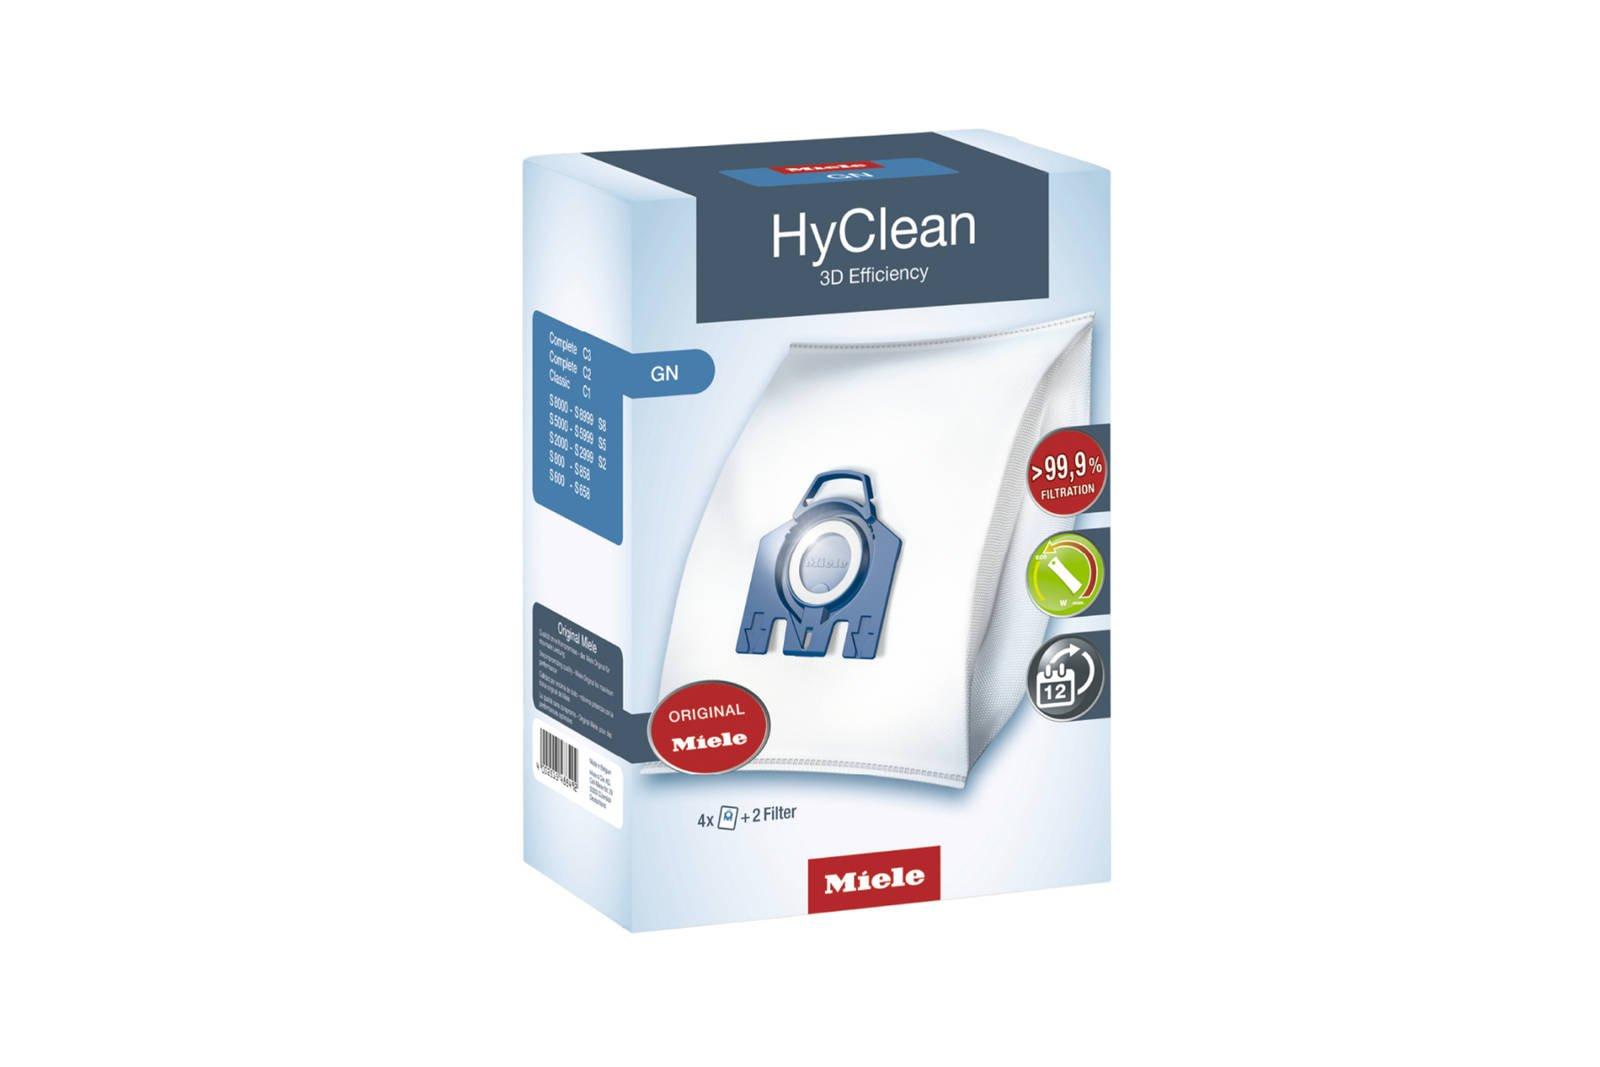 Original Vacuum bags Miele HyClean 3D Efficiency GN 4x Bags + 2x Filters